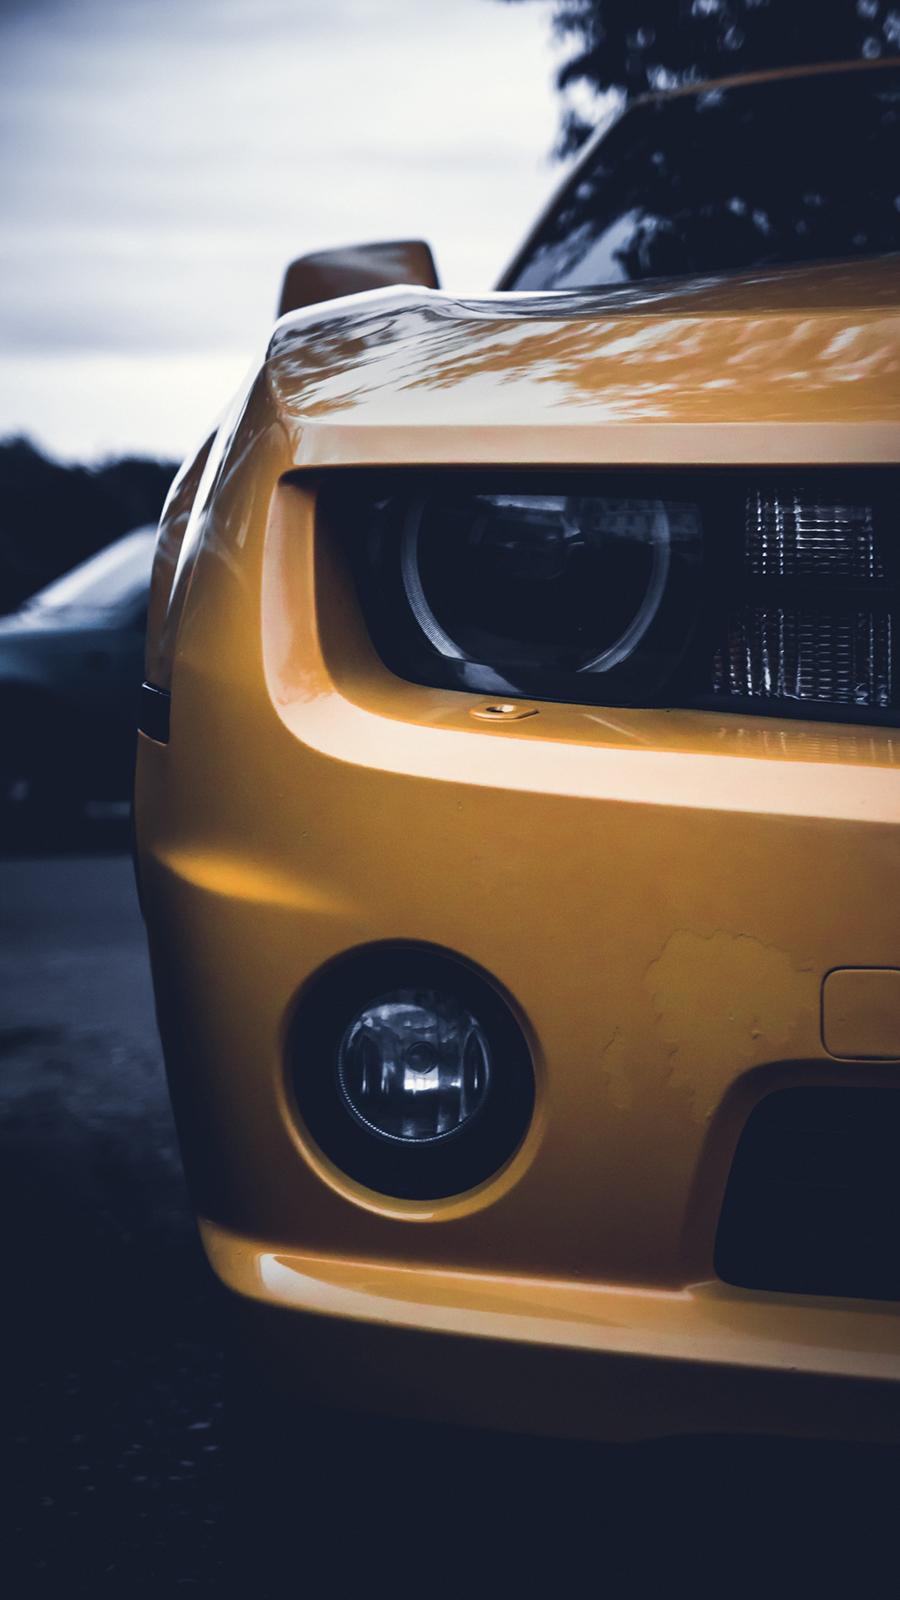 Chevrolet Camaro Retro Wallpapers Free Download